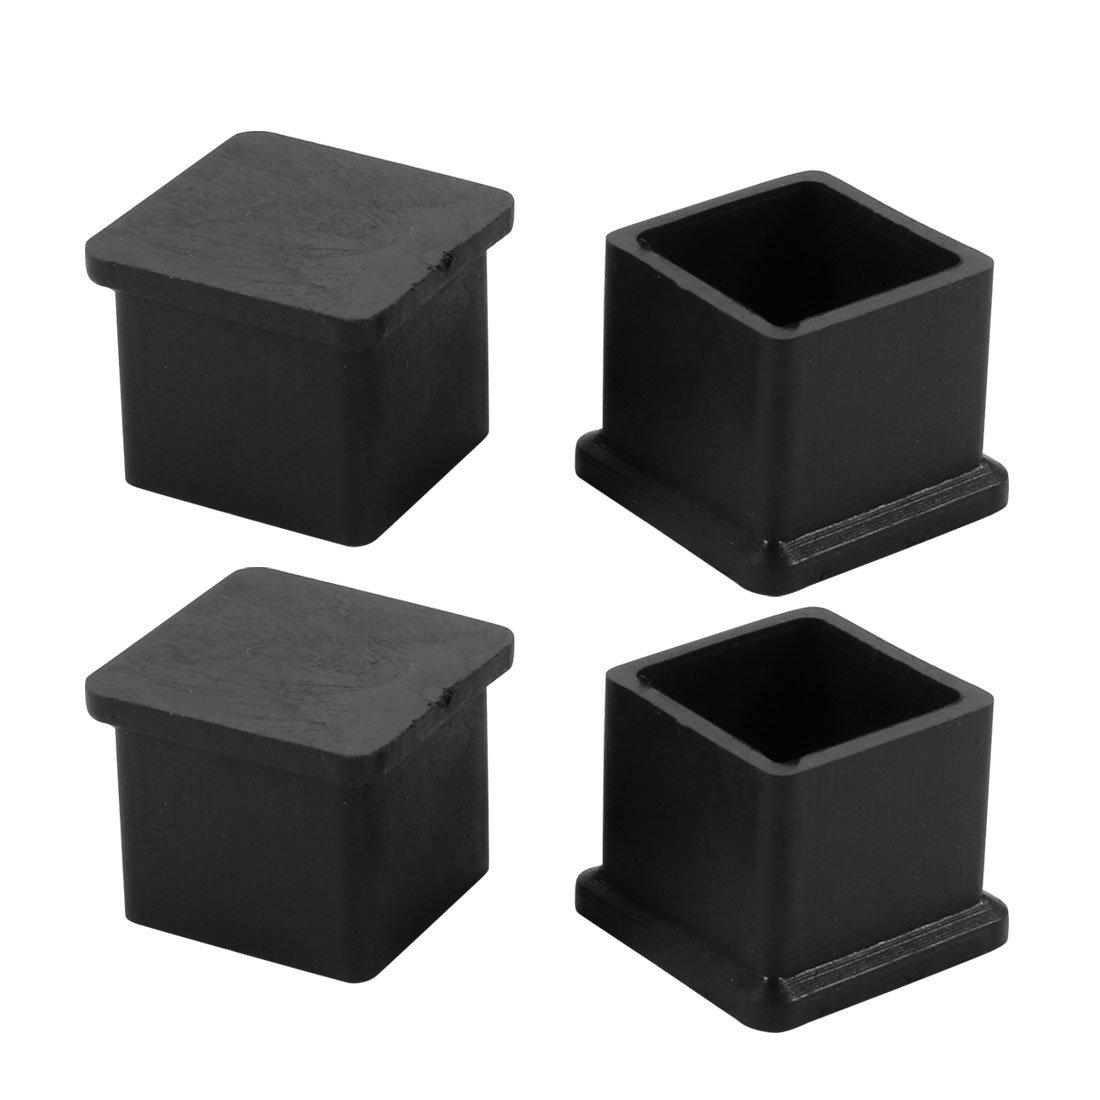 sourcing map 4Stk PVC-Gummi Quadrat Stuhl Einsatz Bodenbelag Protektor 21x21mm Schwarz de